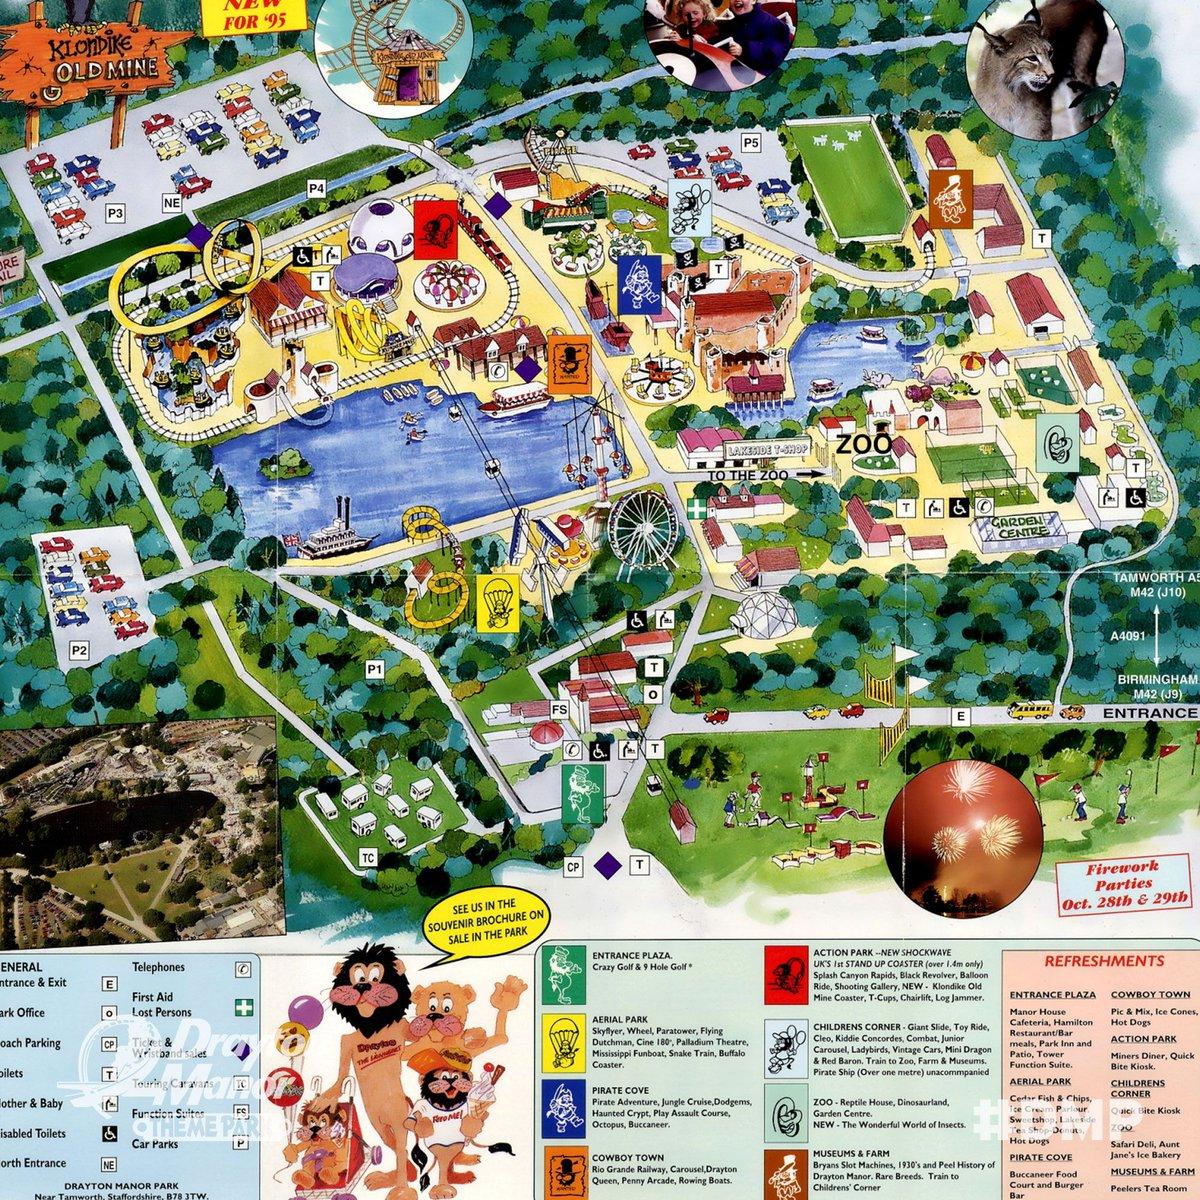 Drayton Manor Map Drayton Manor on Twitter: